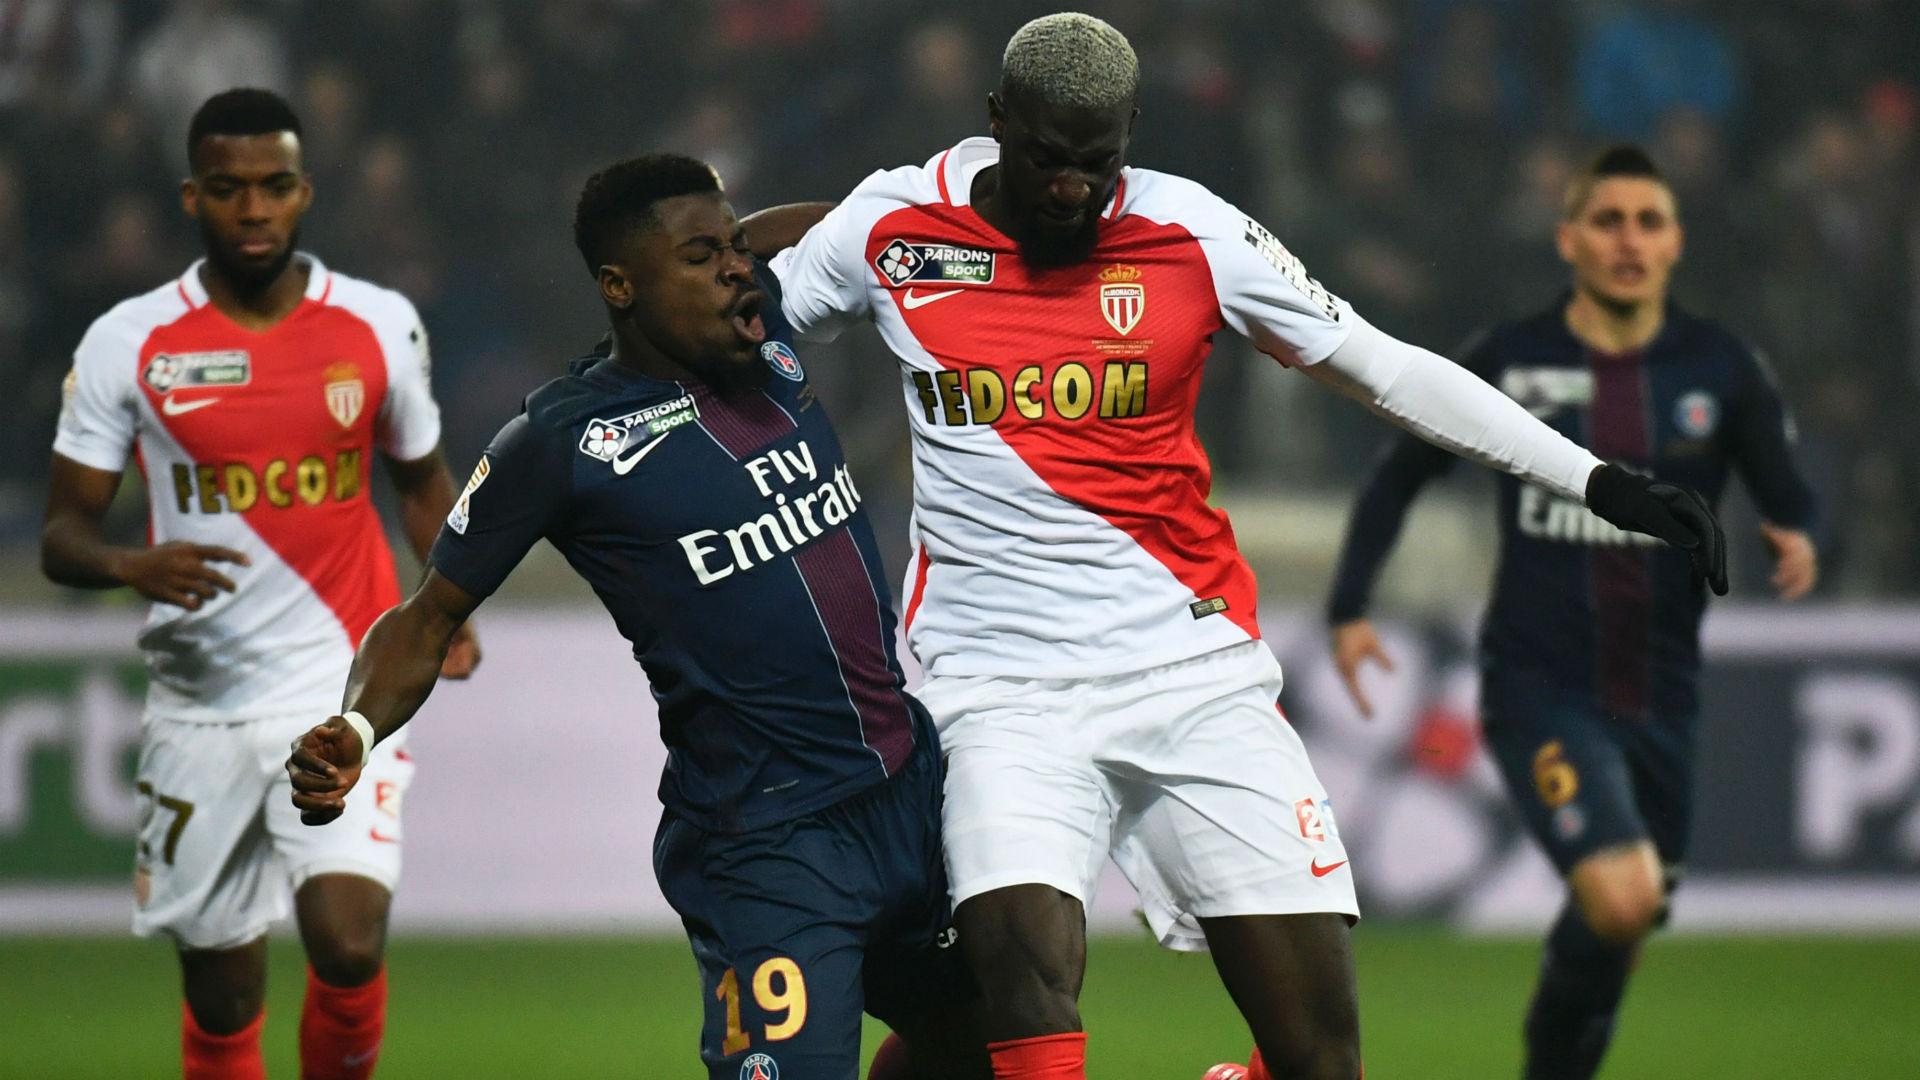 Tiemoue Bakayoko Serge Aurier PSG Monaco Coupe de la Ligue 01042017